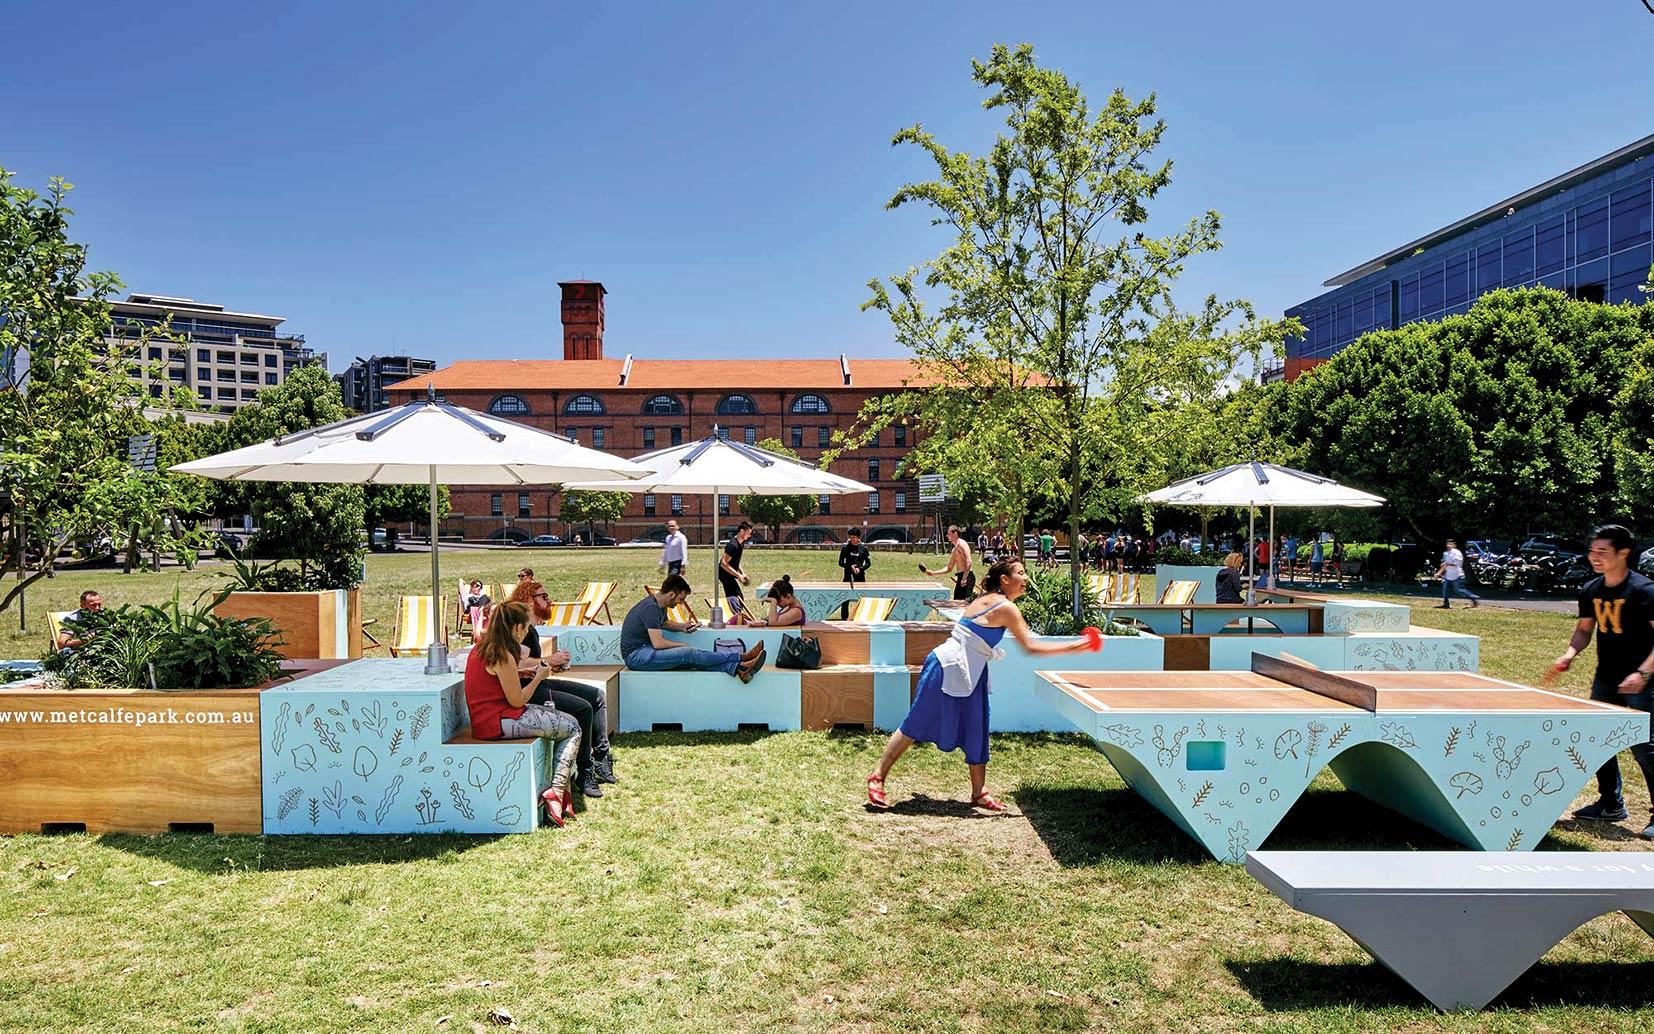 Metcalfe Park, NSW, Australia